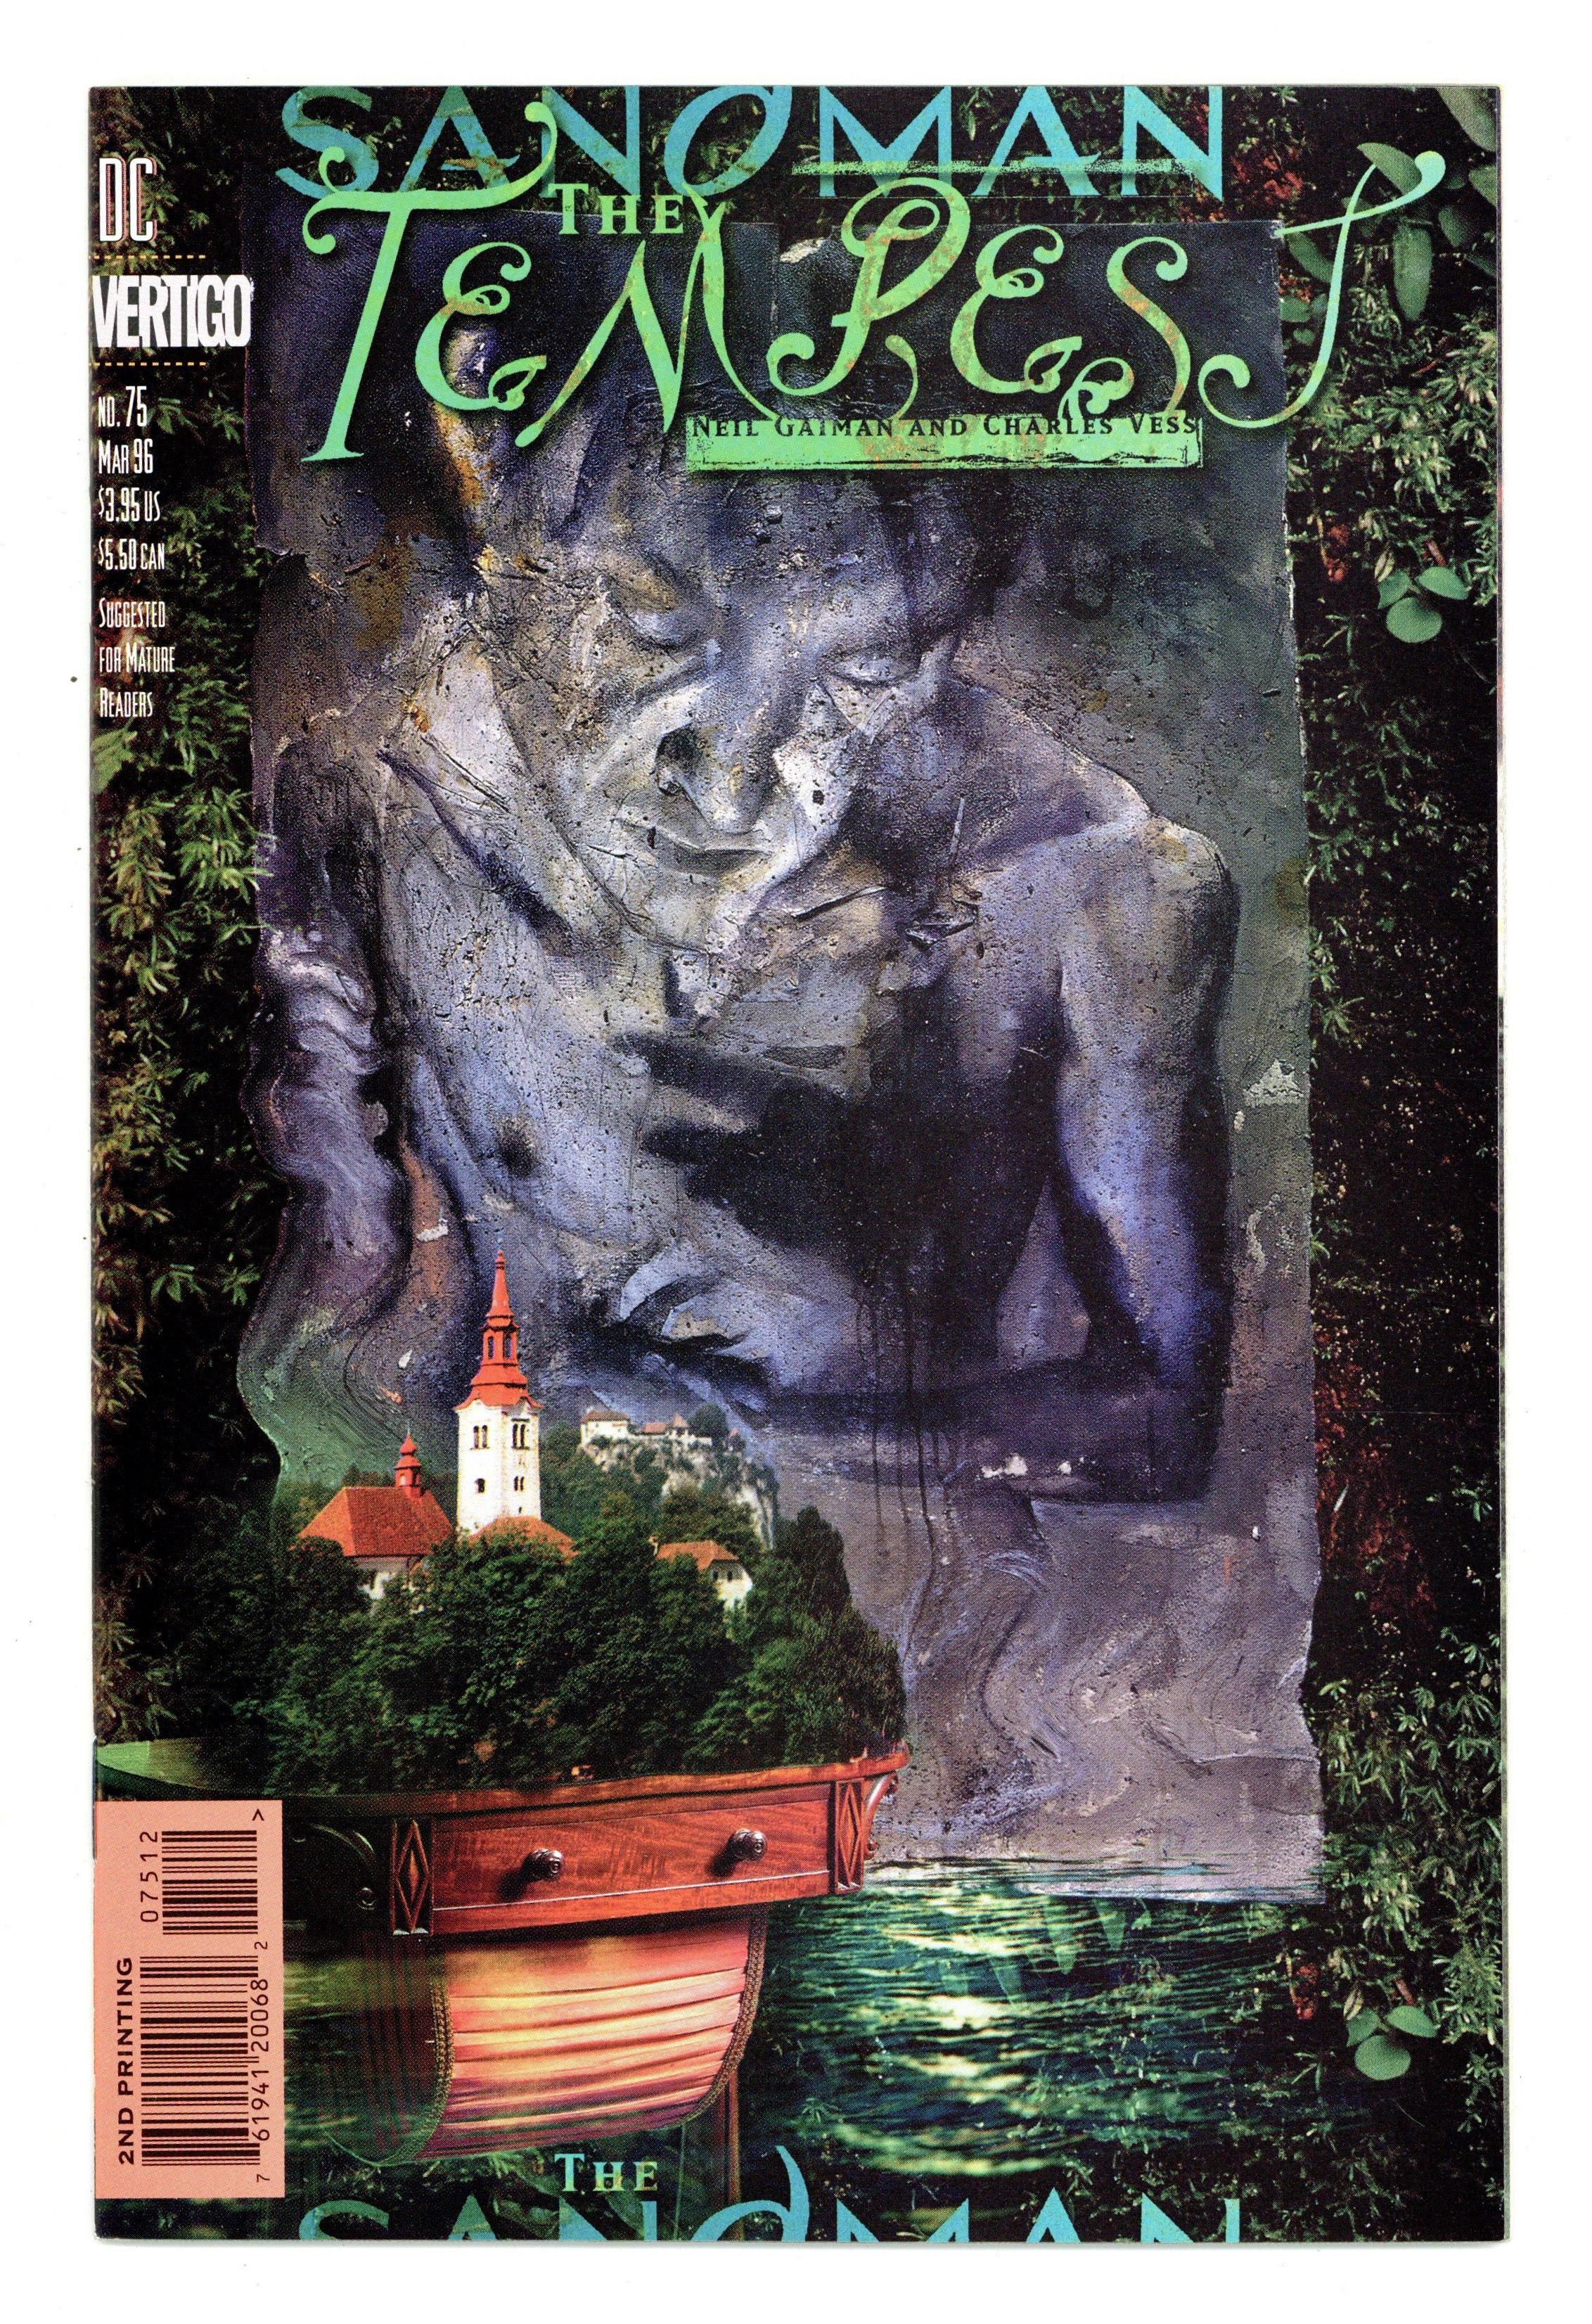 Sandman #75 Comic DC Vertigo 1996 FINAL ISSUE Tempest Neil Gaiman Charles Vess